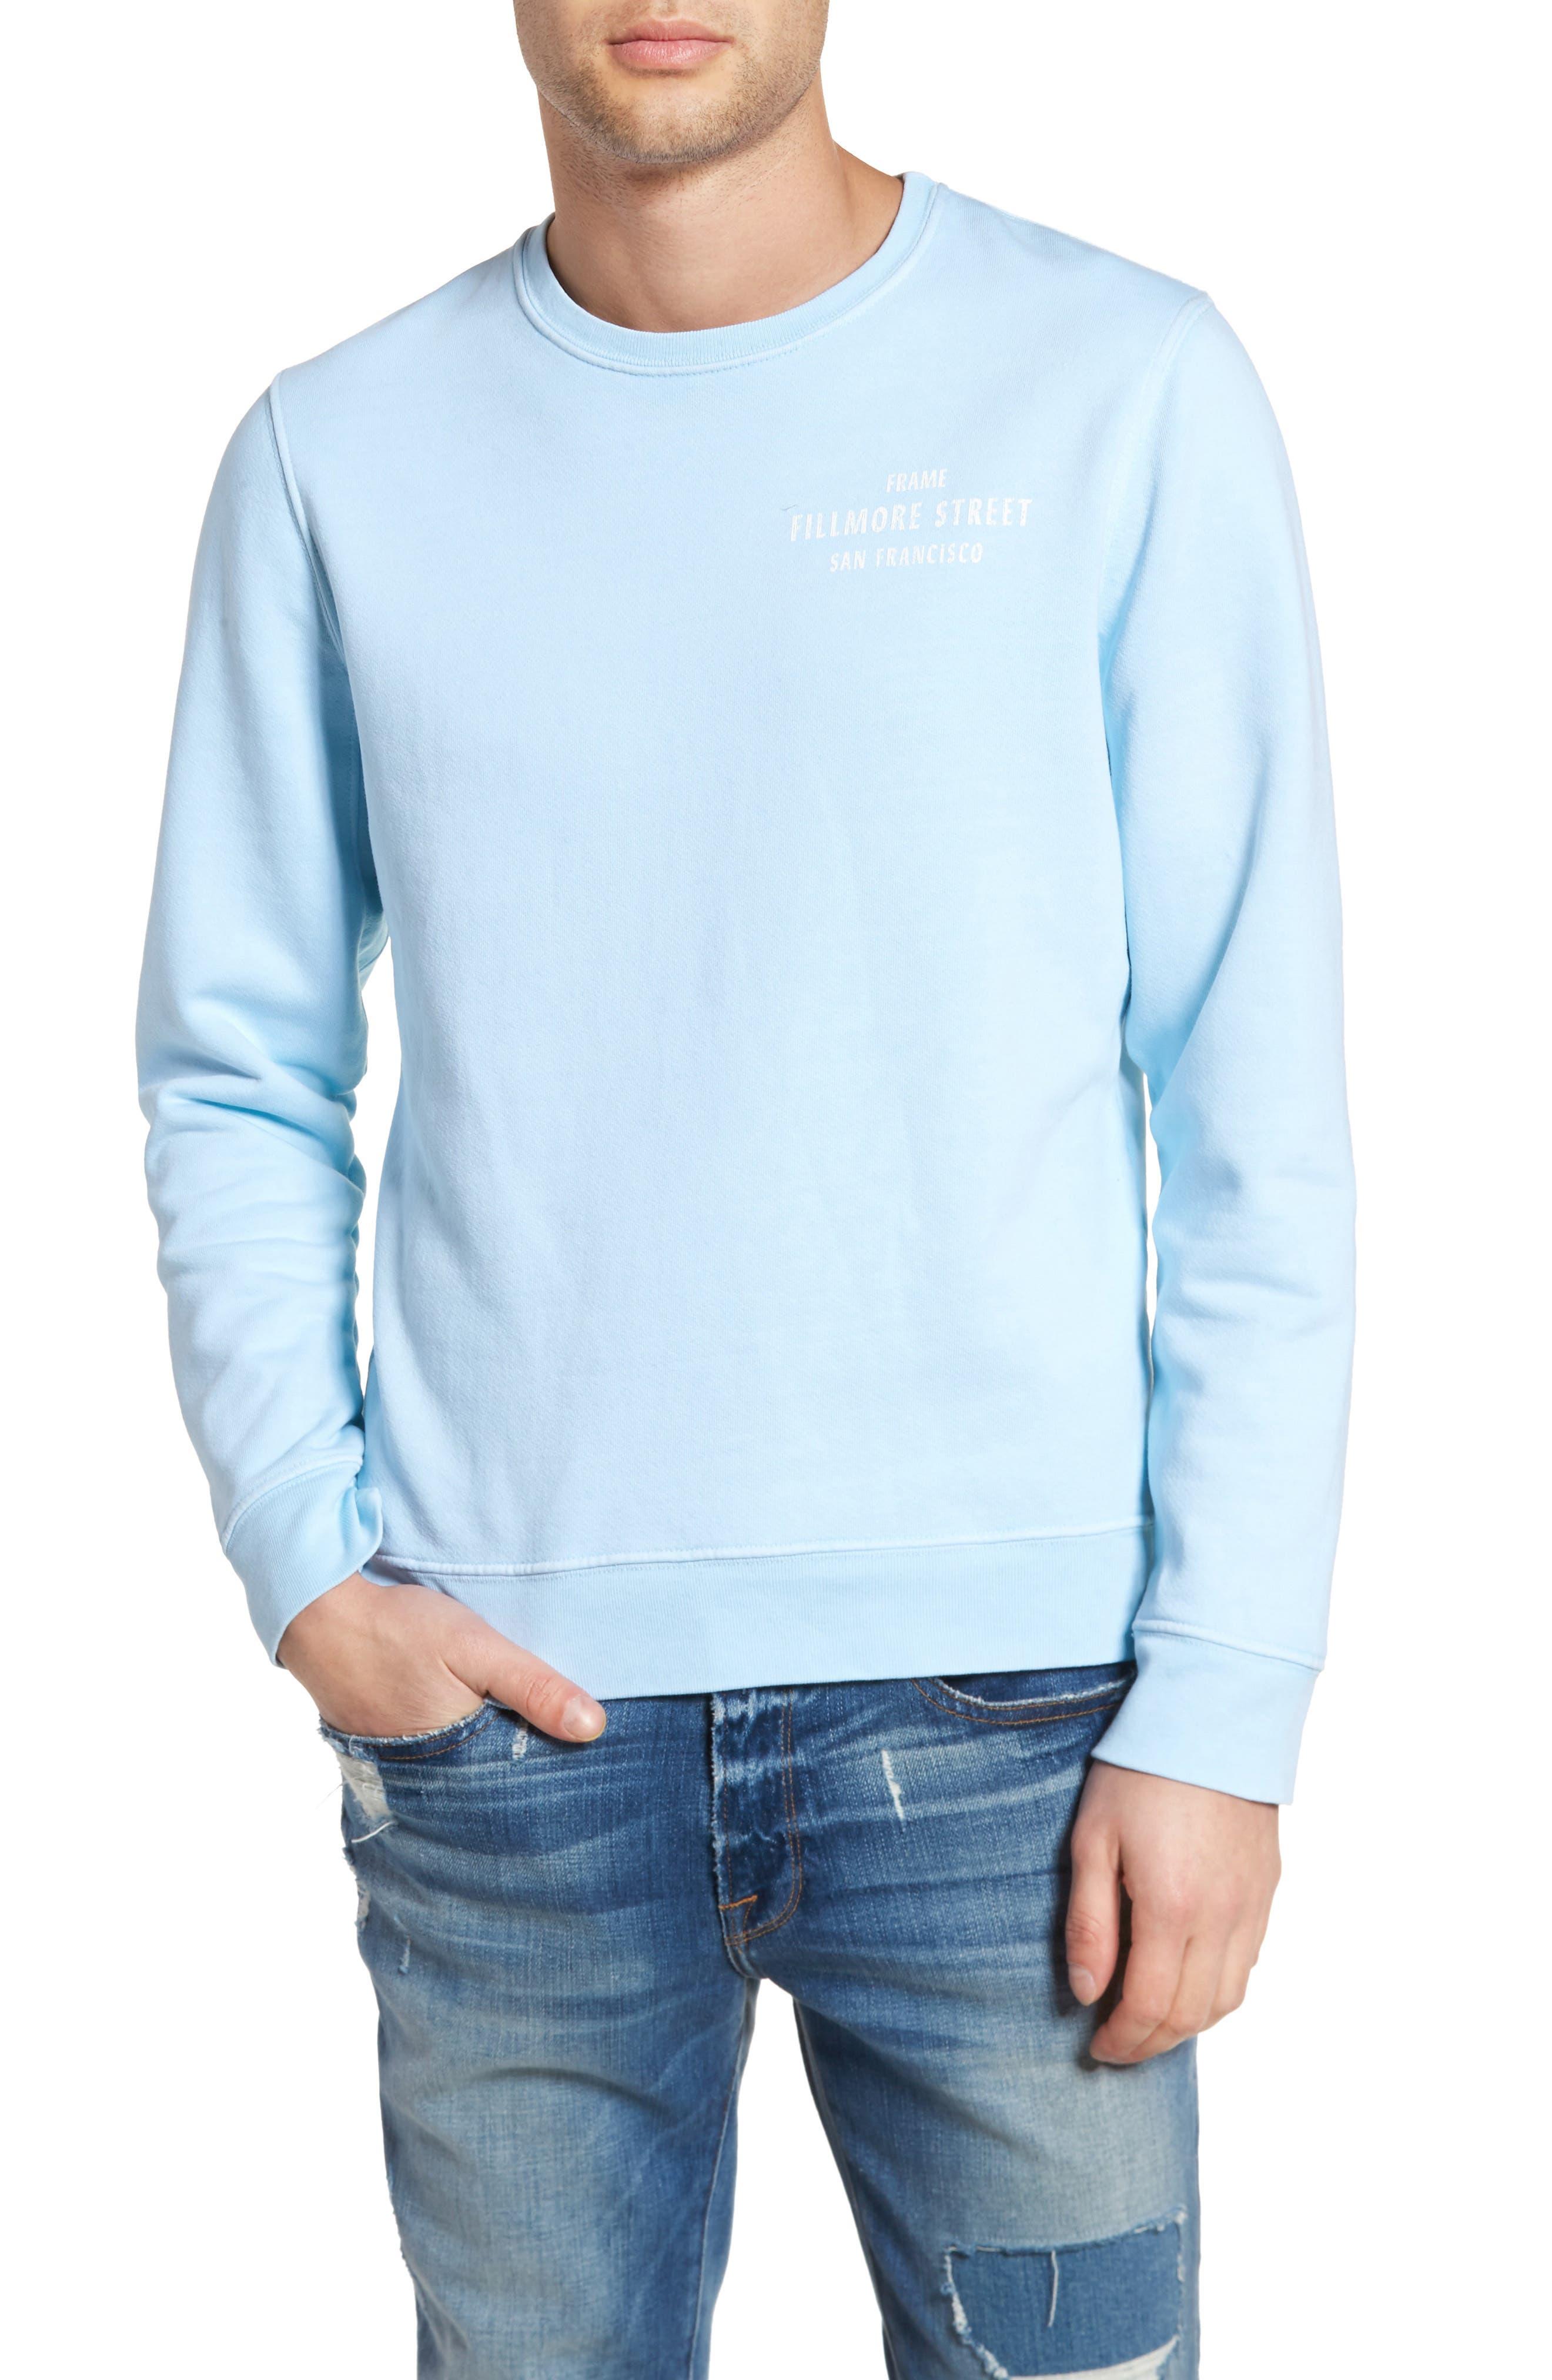 Vintage Crewneck Sweatshirt,                             Main thumbnail 1, color,                             400